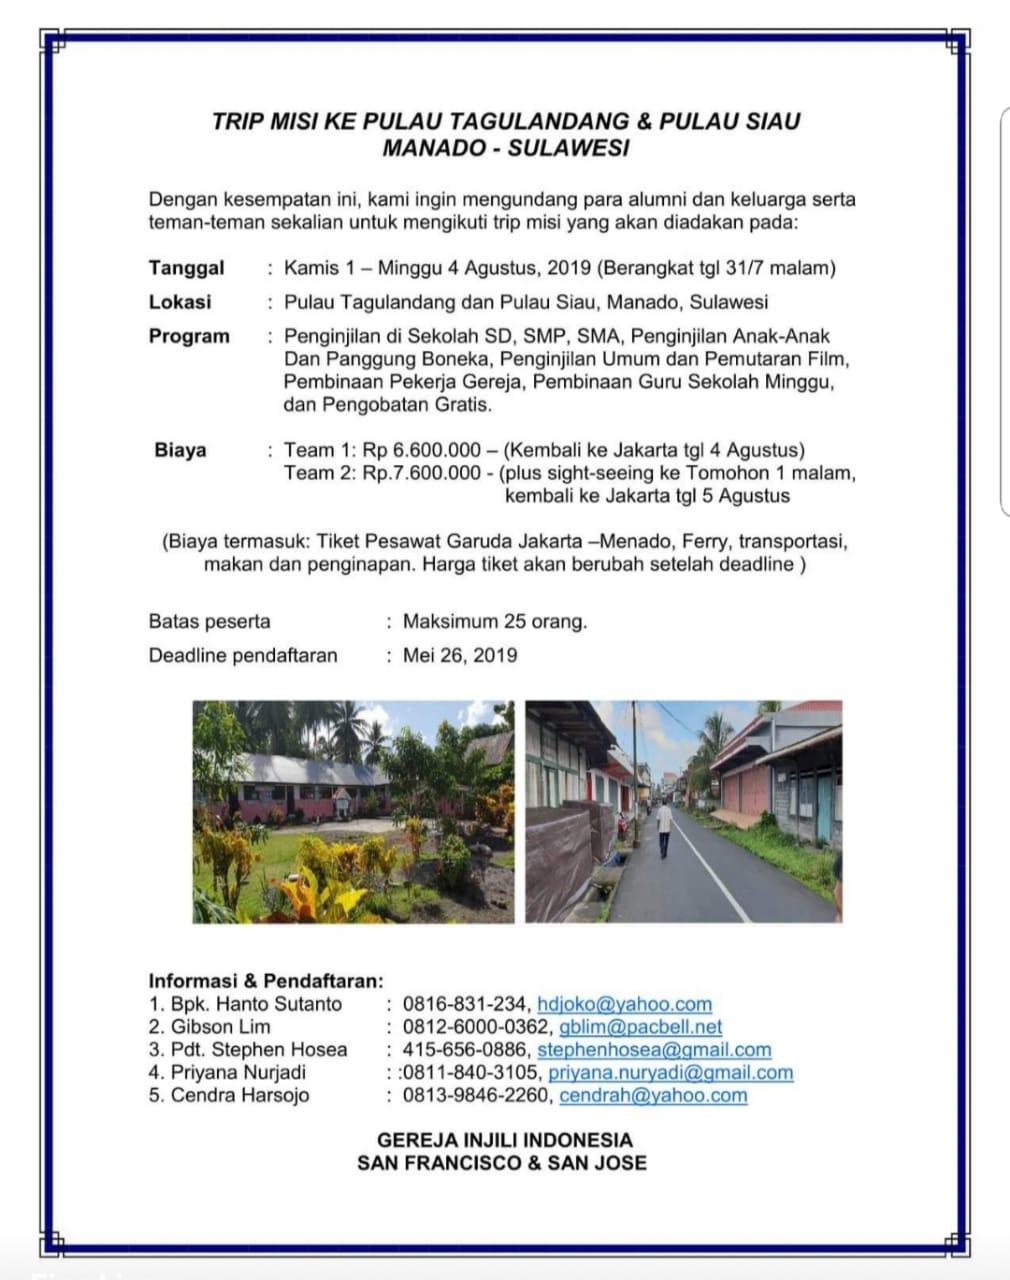 Manado Mission Trip